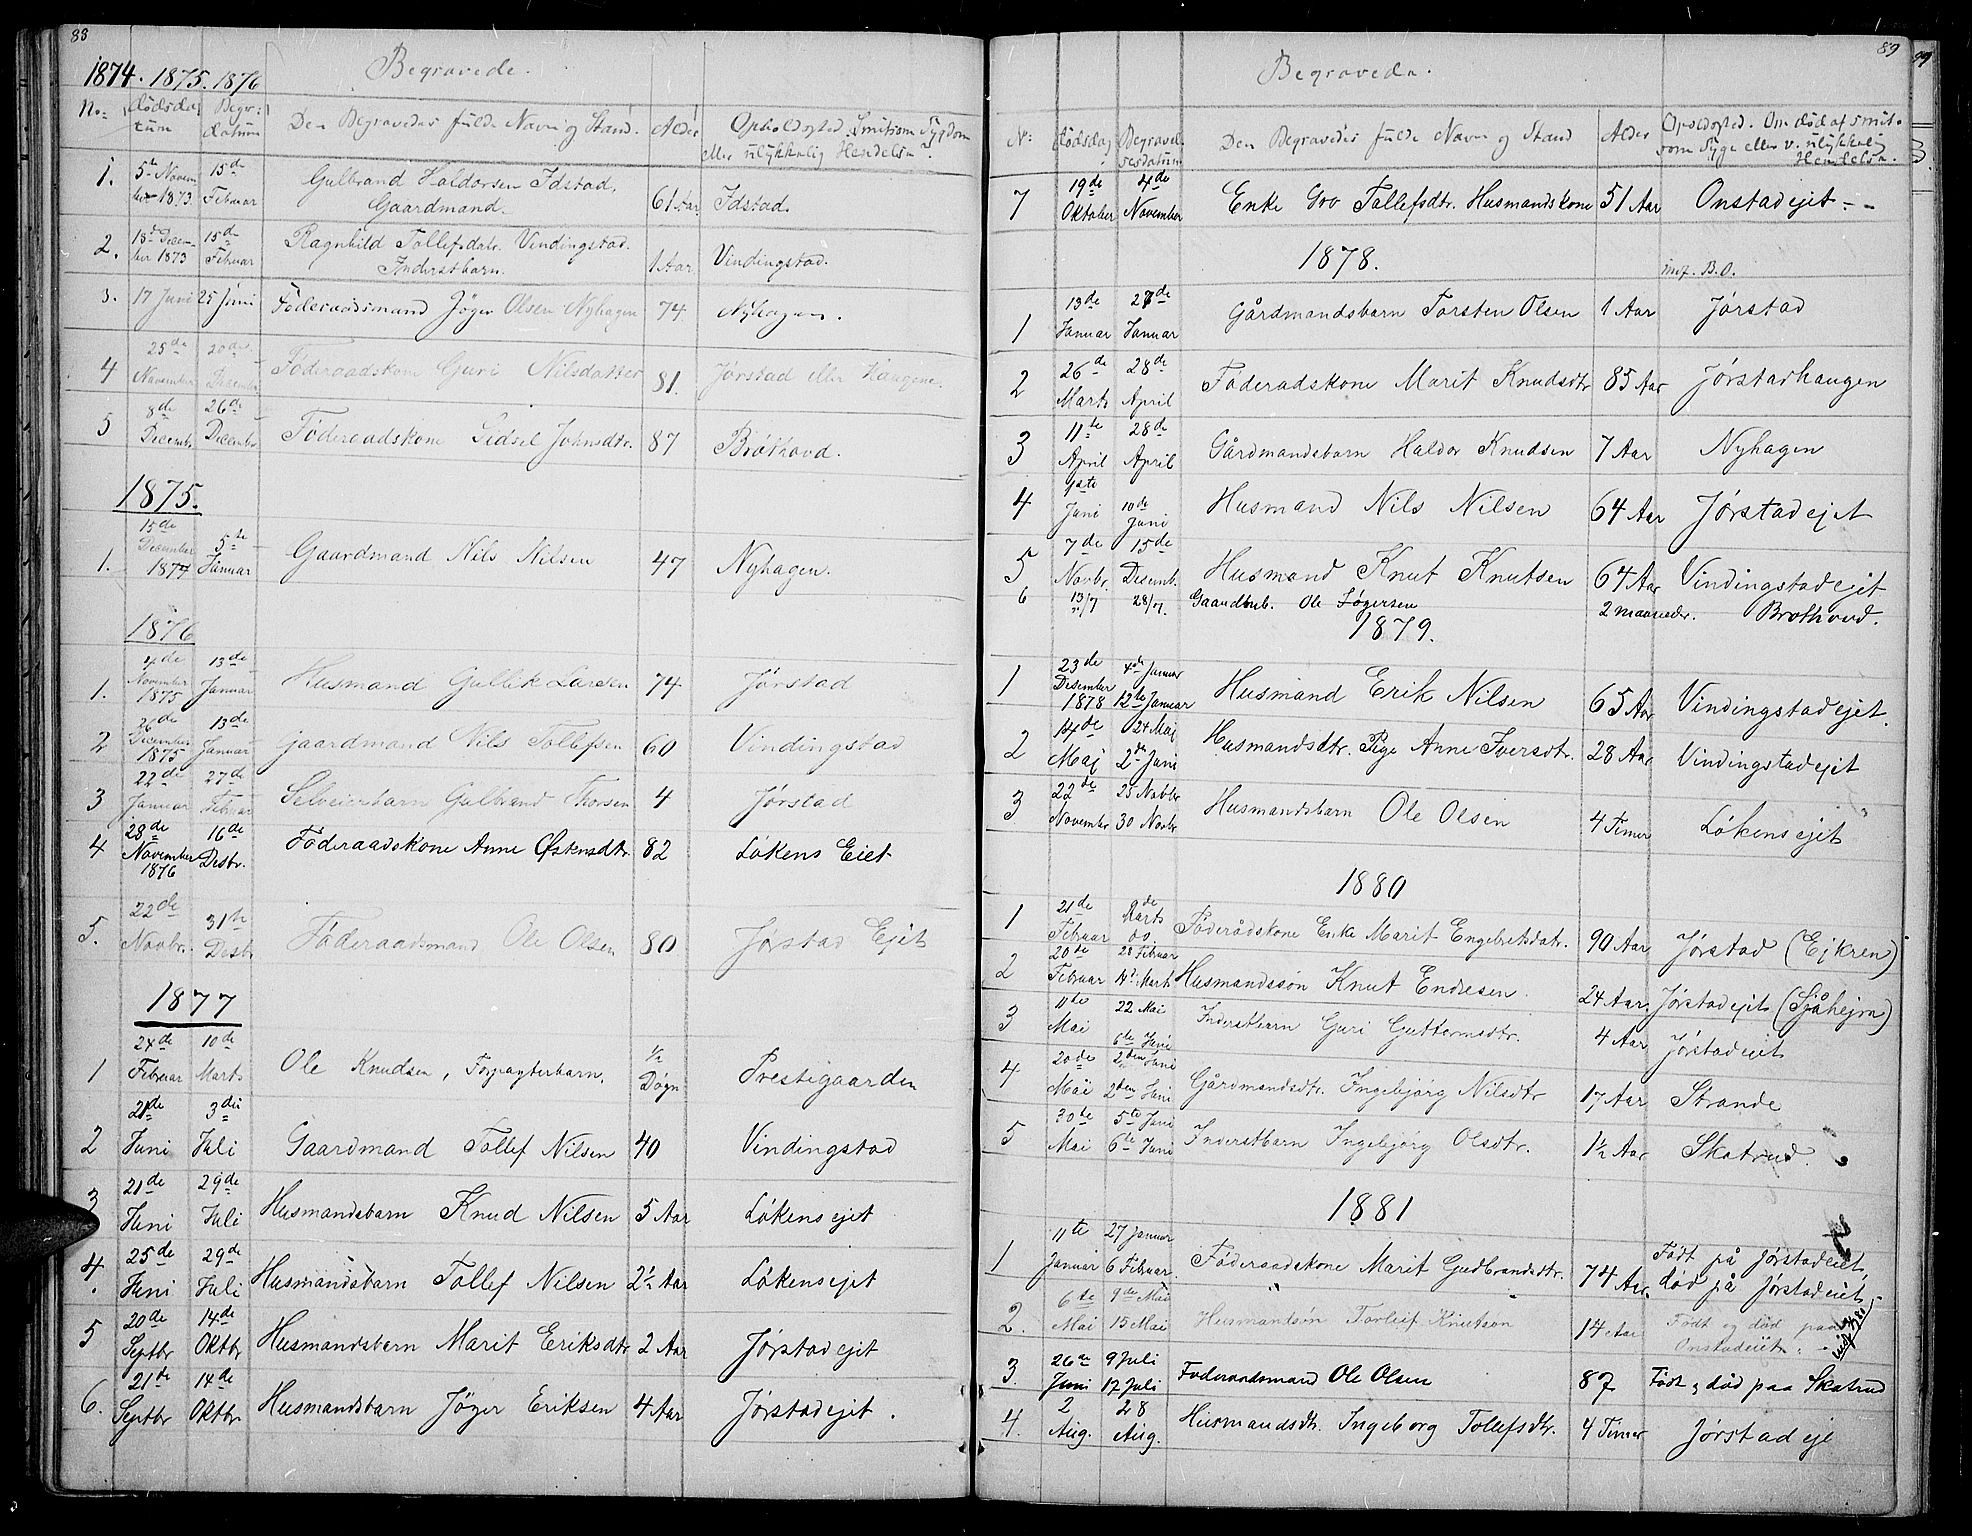 SAH, Øystre Slidre prestekontor, Klokkerbok nr. 2, 1866-1886, s. 88-89